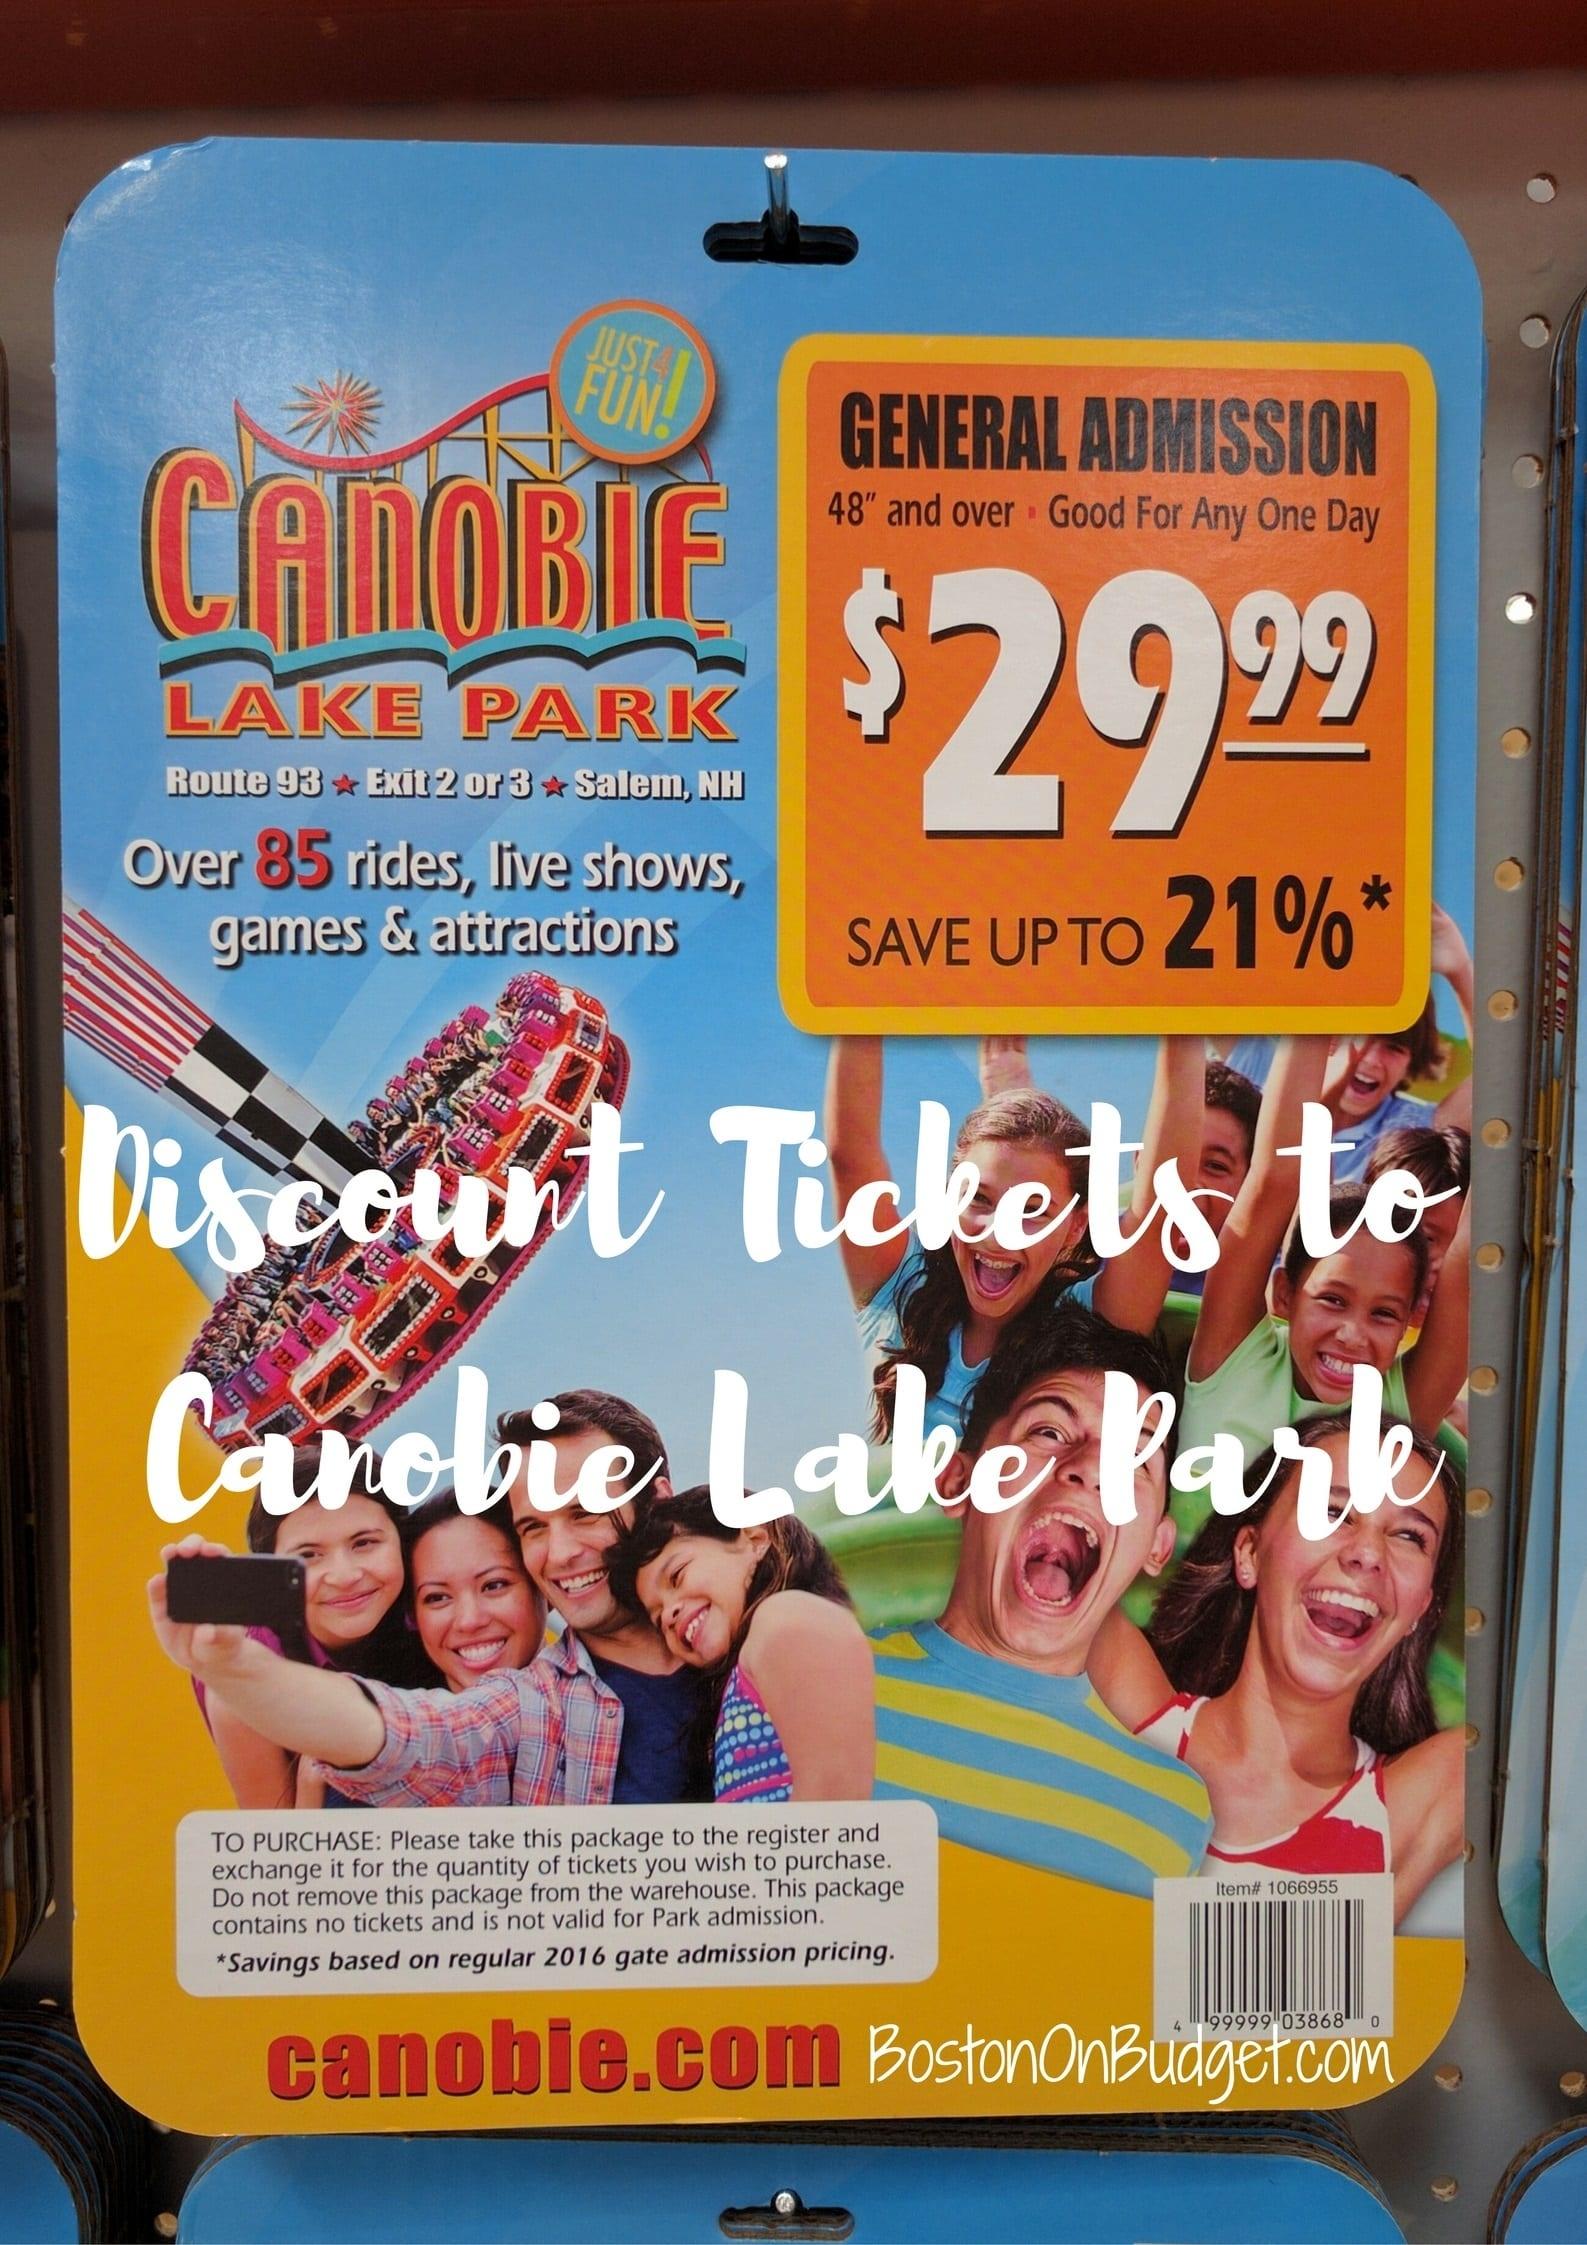 Canobie Lake Park Discounts - Boston On Budget - Free Printable Coupons For Canobie Lake Park